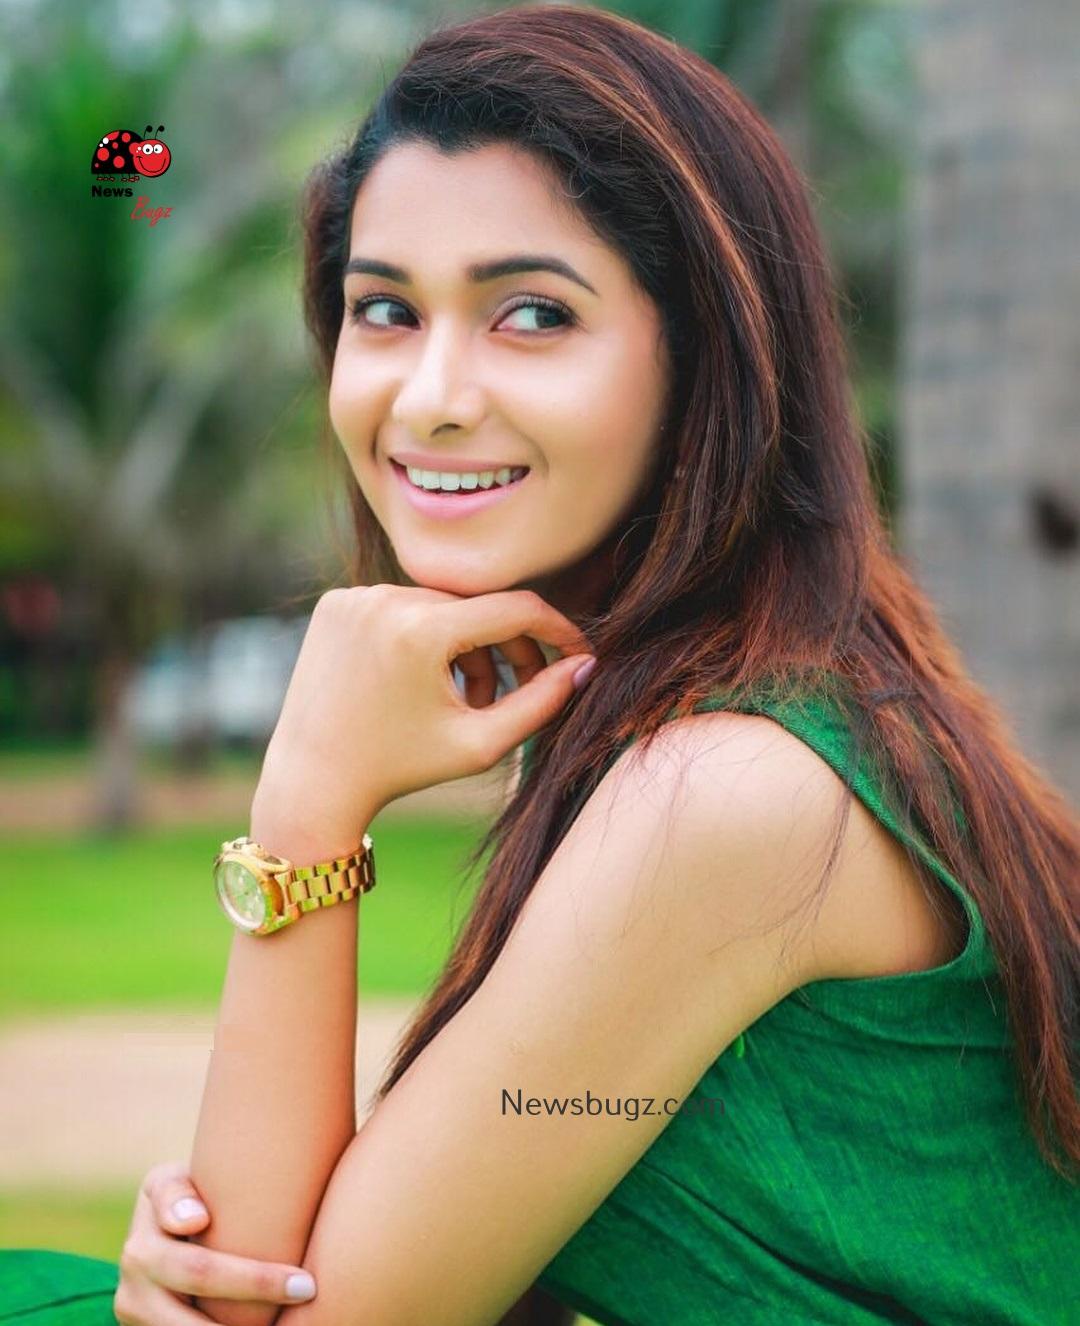 Kollywood Actress Priya Bhavani Shankar Latest Hd Photos: Priya Bhavani Shankar Images (15)